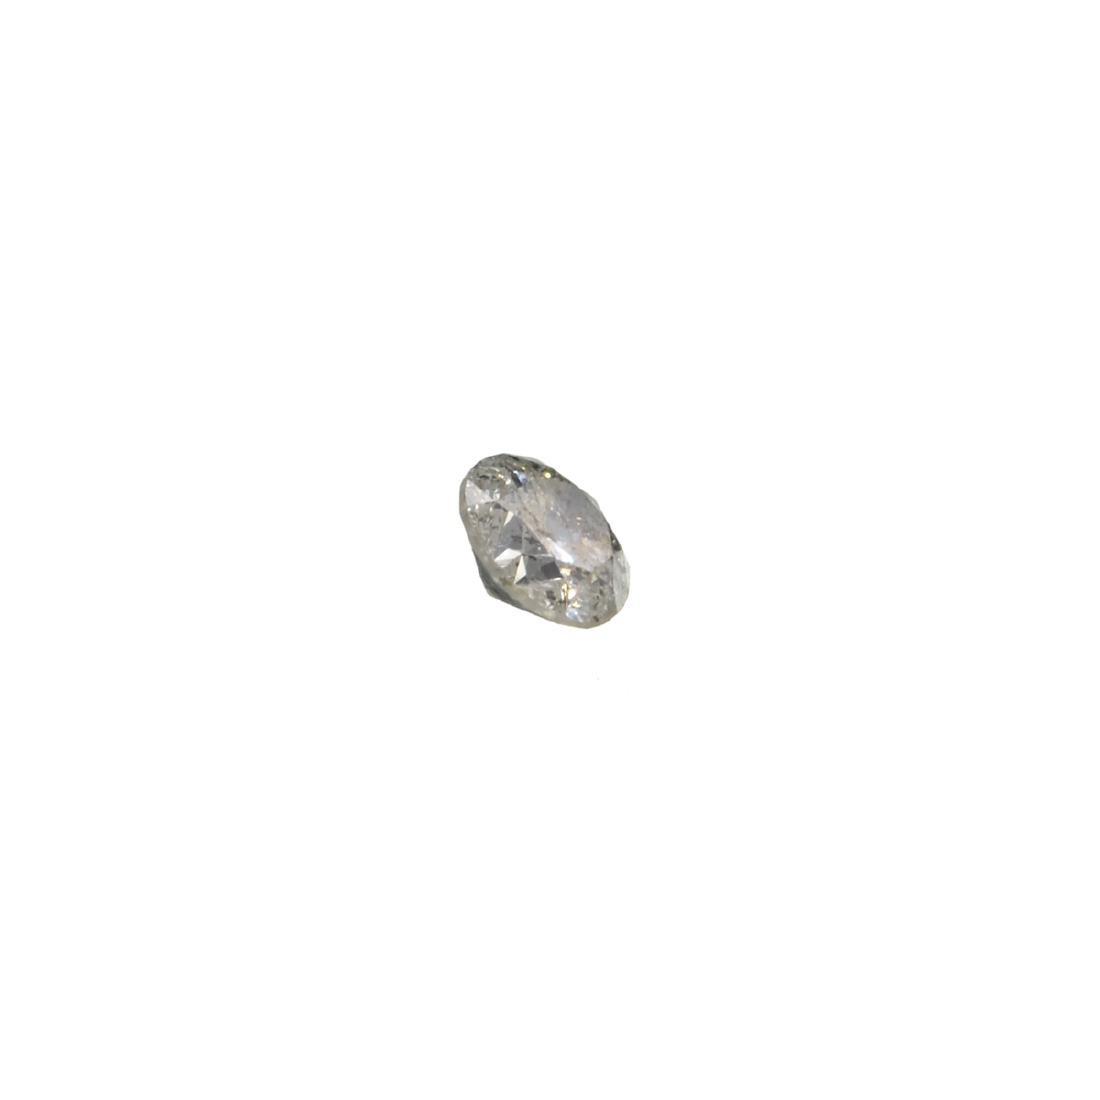 Fine Jewelry GIA Certified 0.37CT Brilliant Round Cut